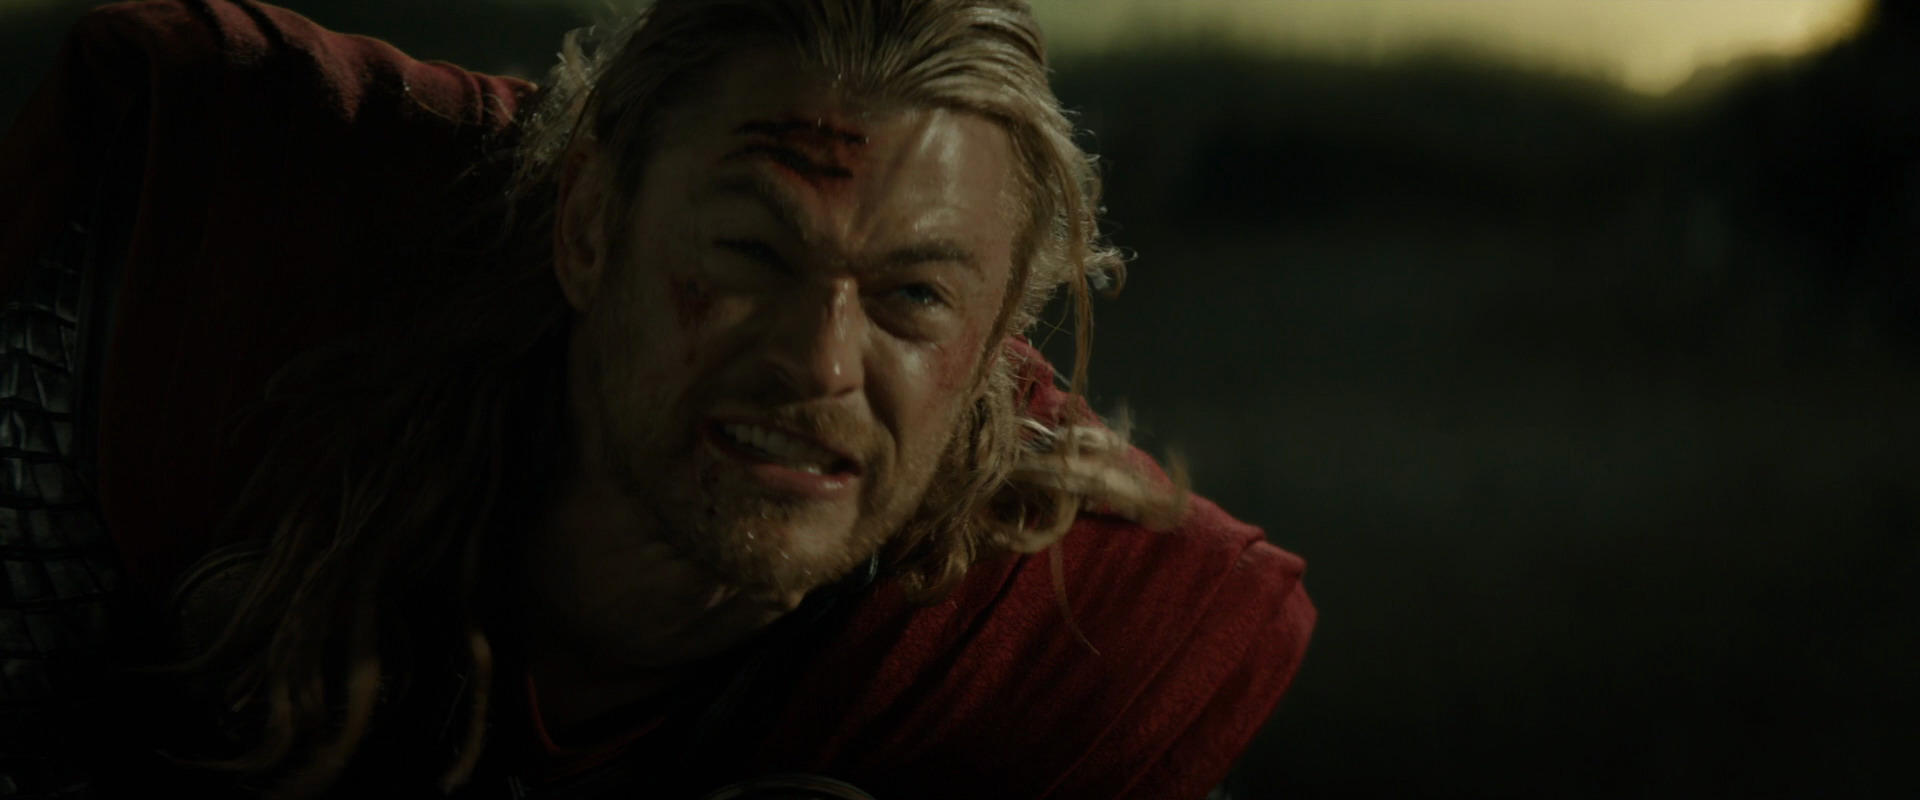 File:Thor screams.jpg